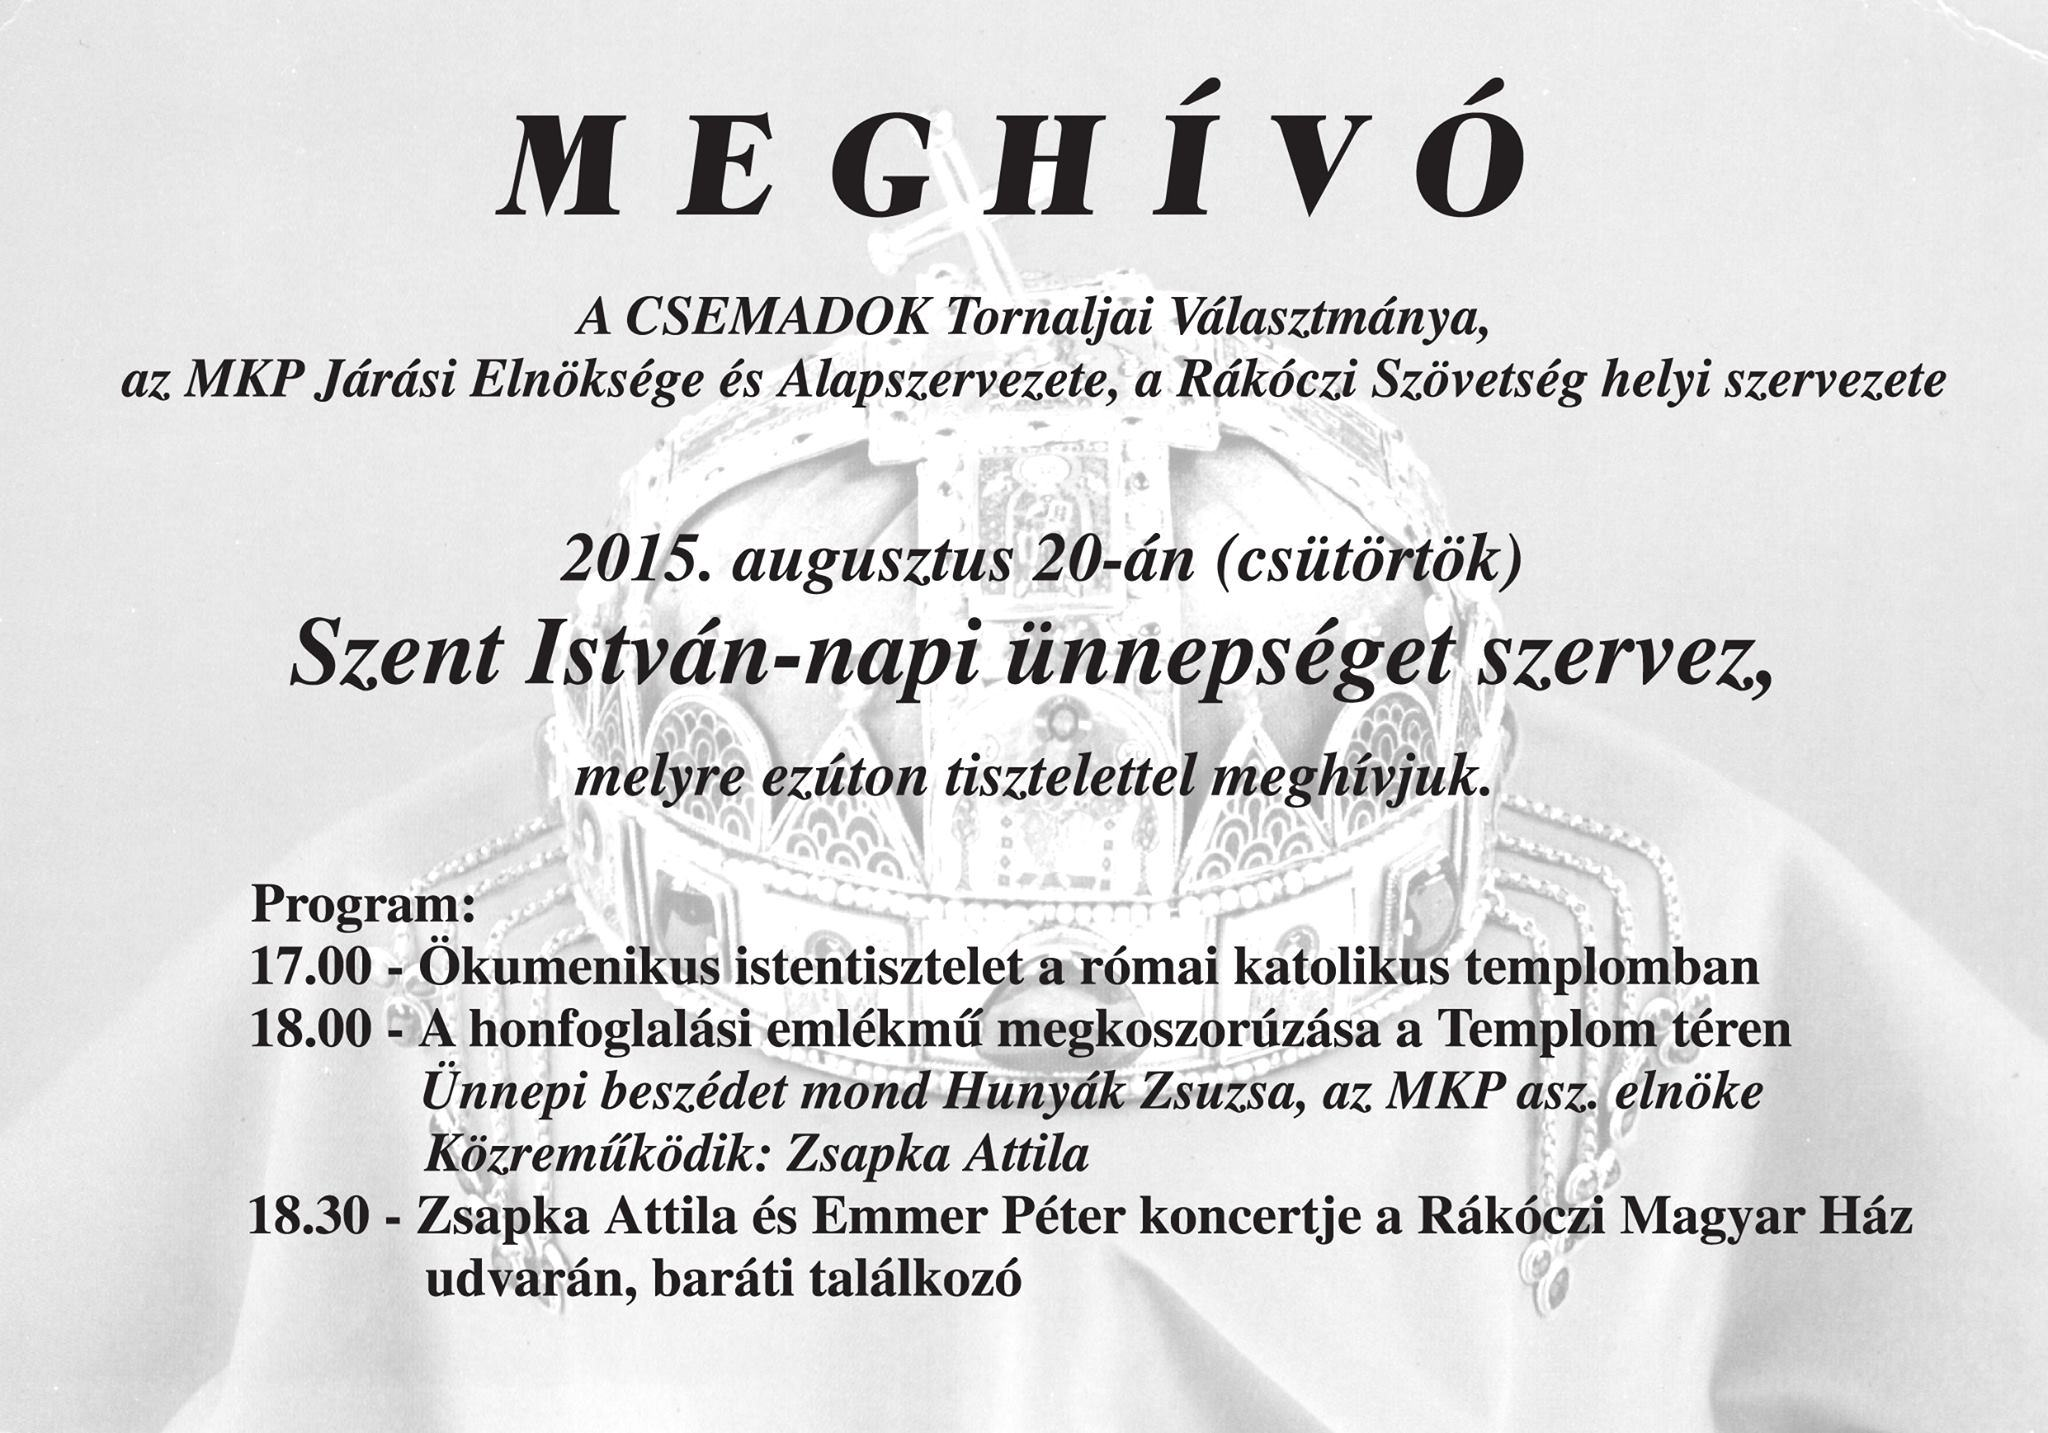 tornalja-szent-istvan-unnep-2015